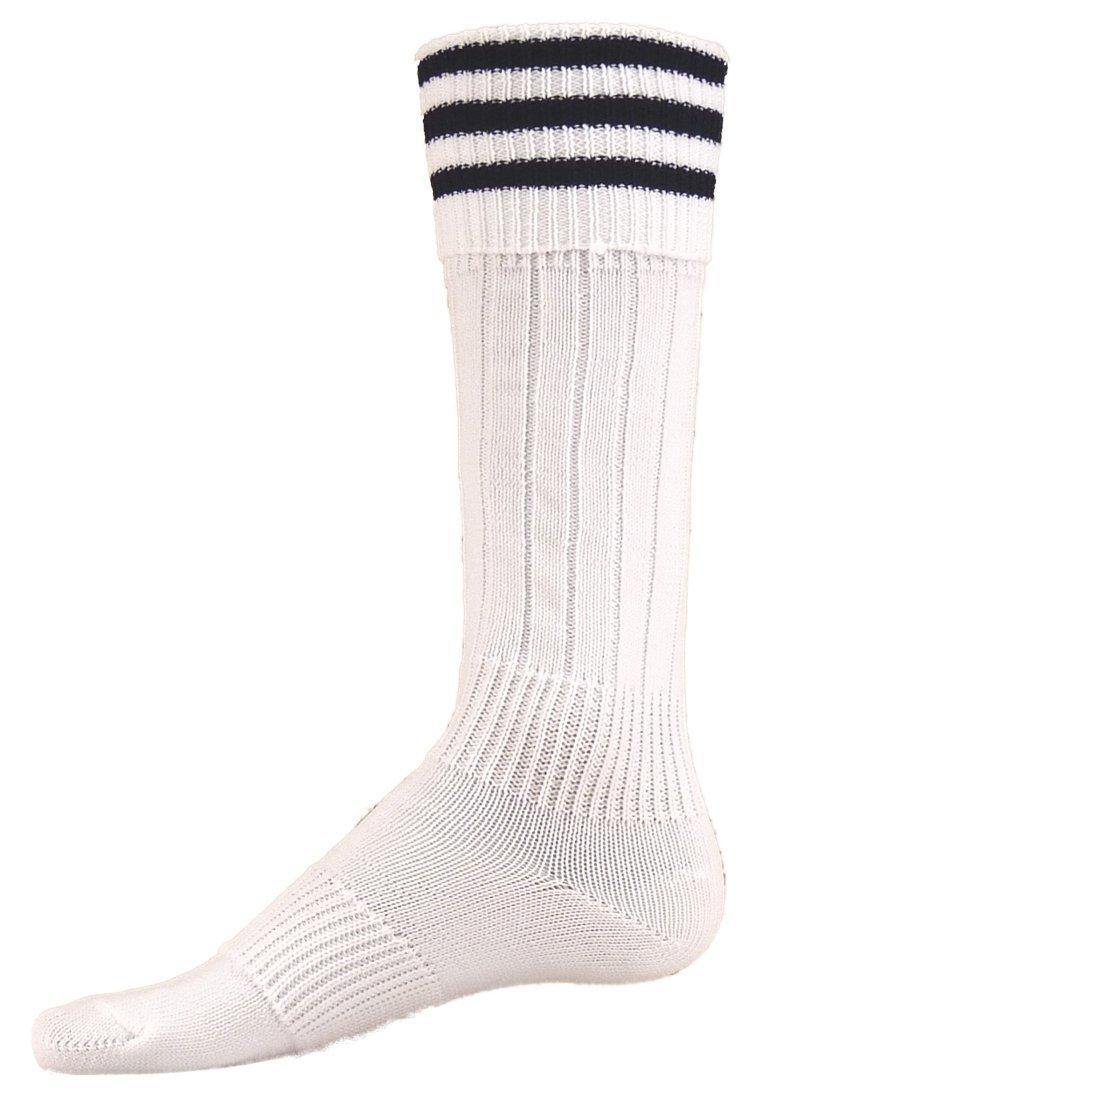 28ae4becb401 Buy Carrots Stripe Kids Knee High Socks (Blue) Size 12-3 in Cheap ...